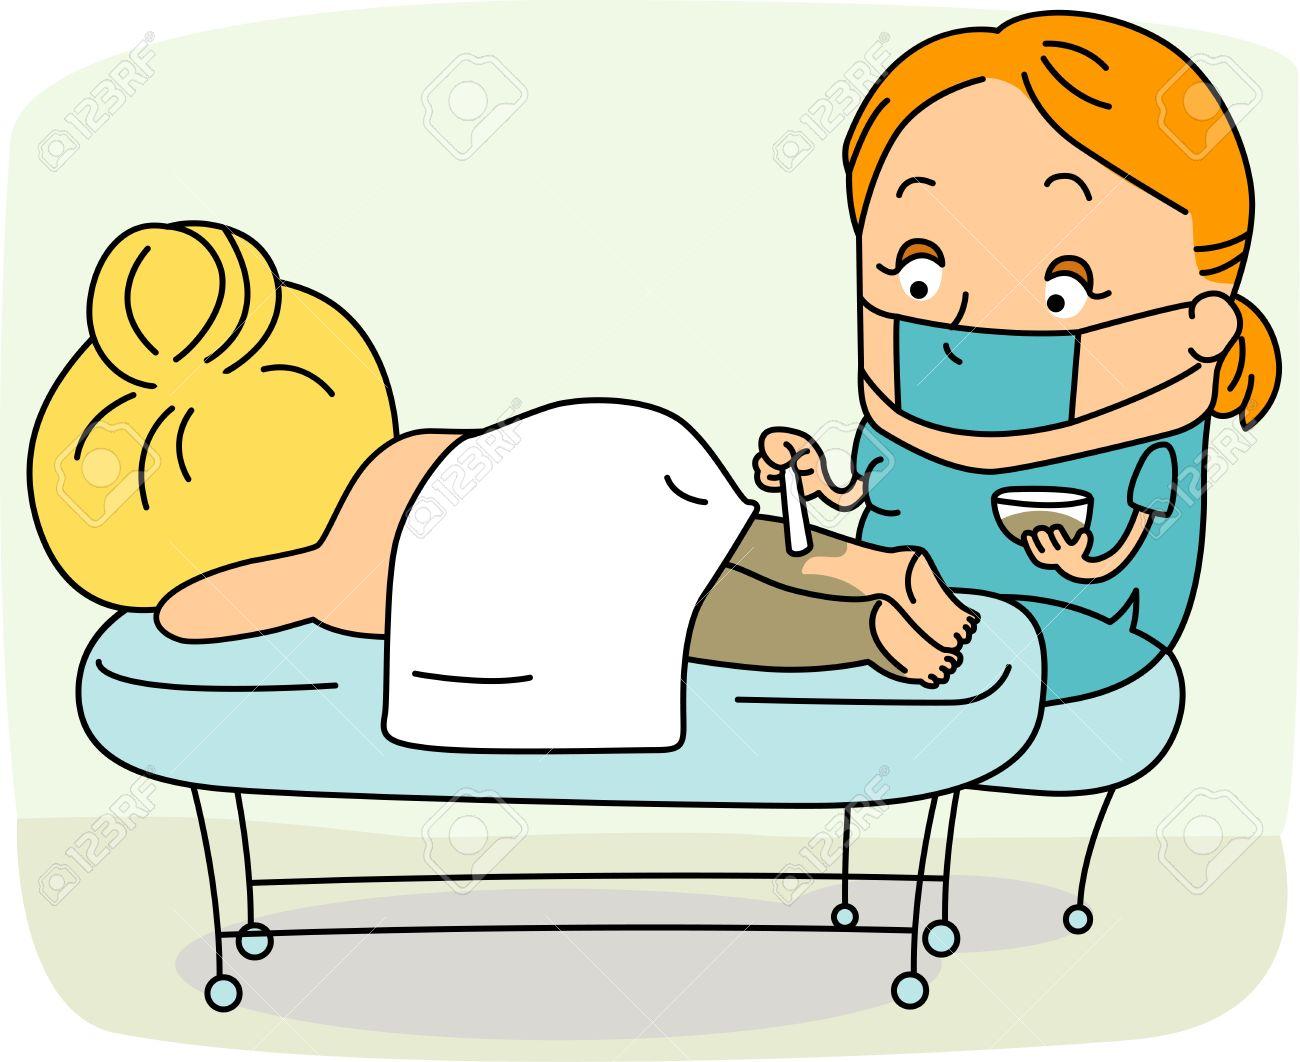 Illustration of a Spa Attendant / Esthetician at Work Stock Illustration - 9456866